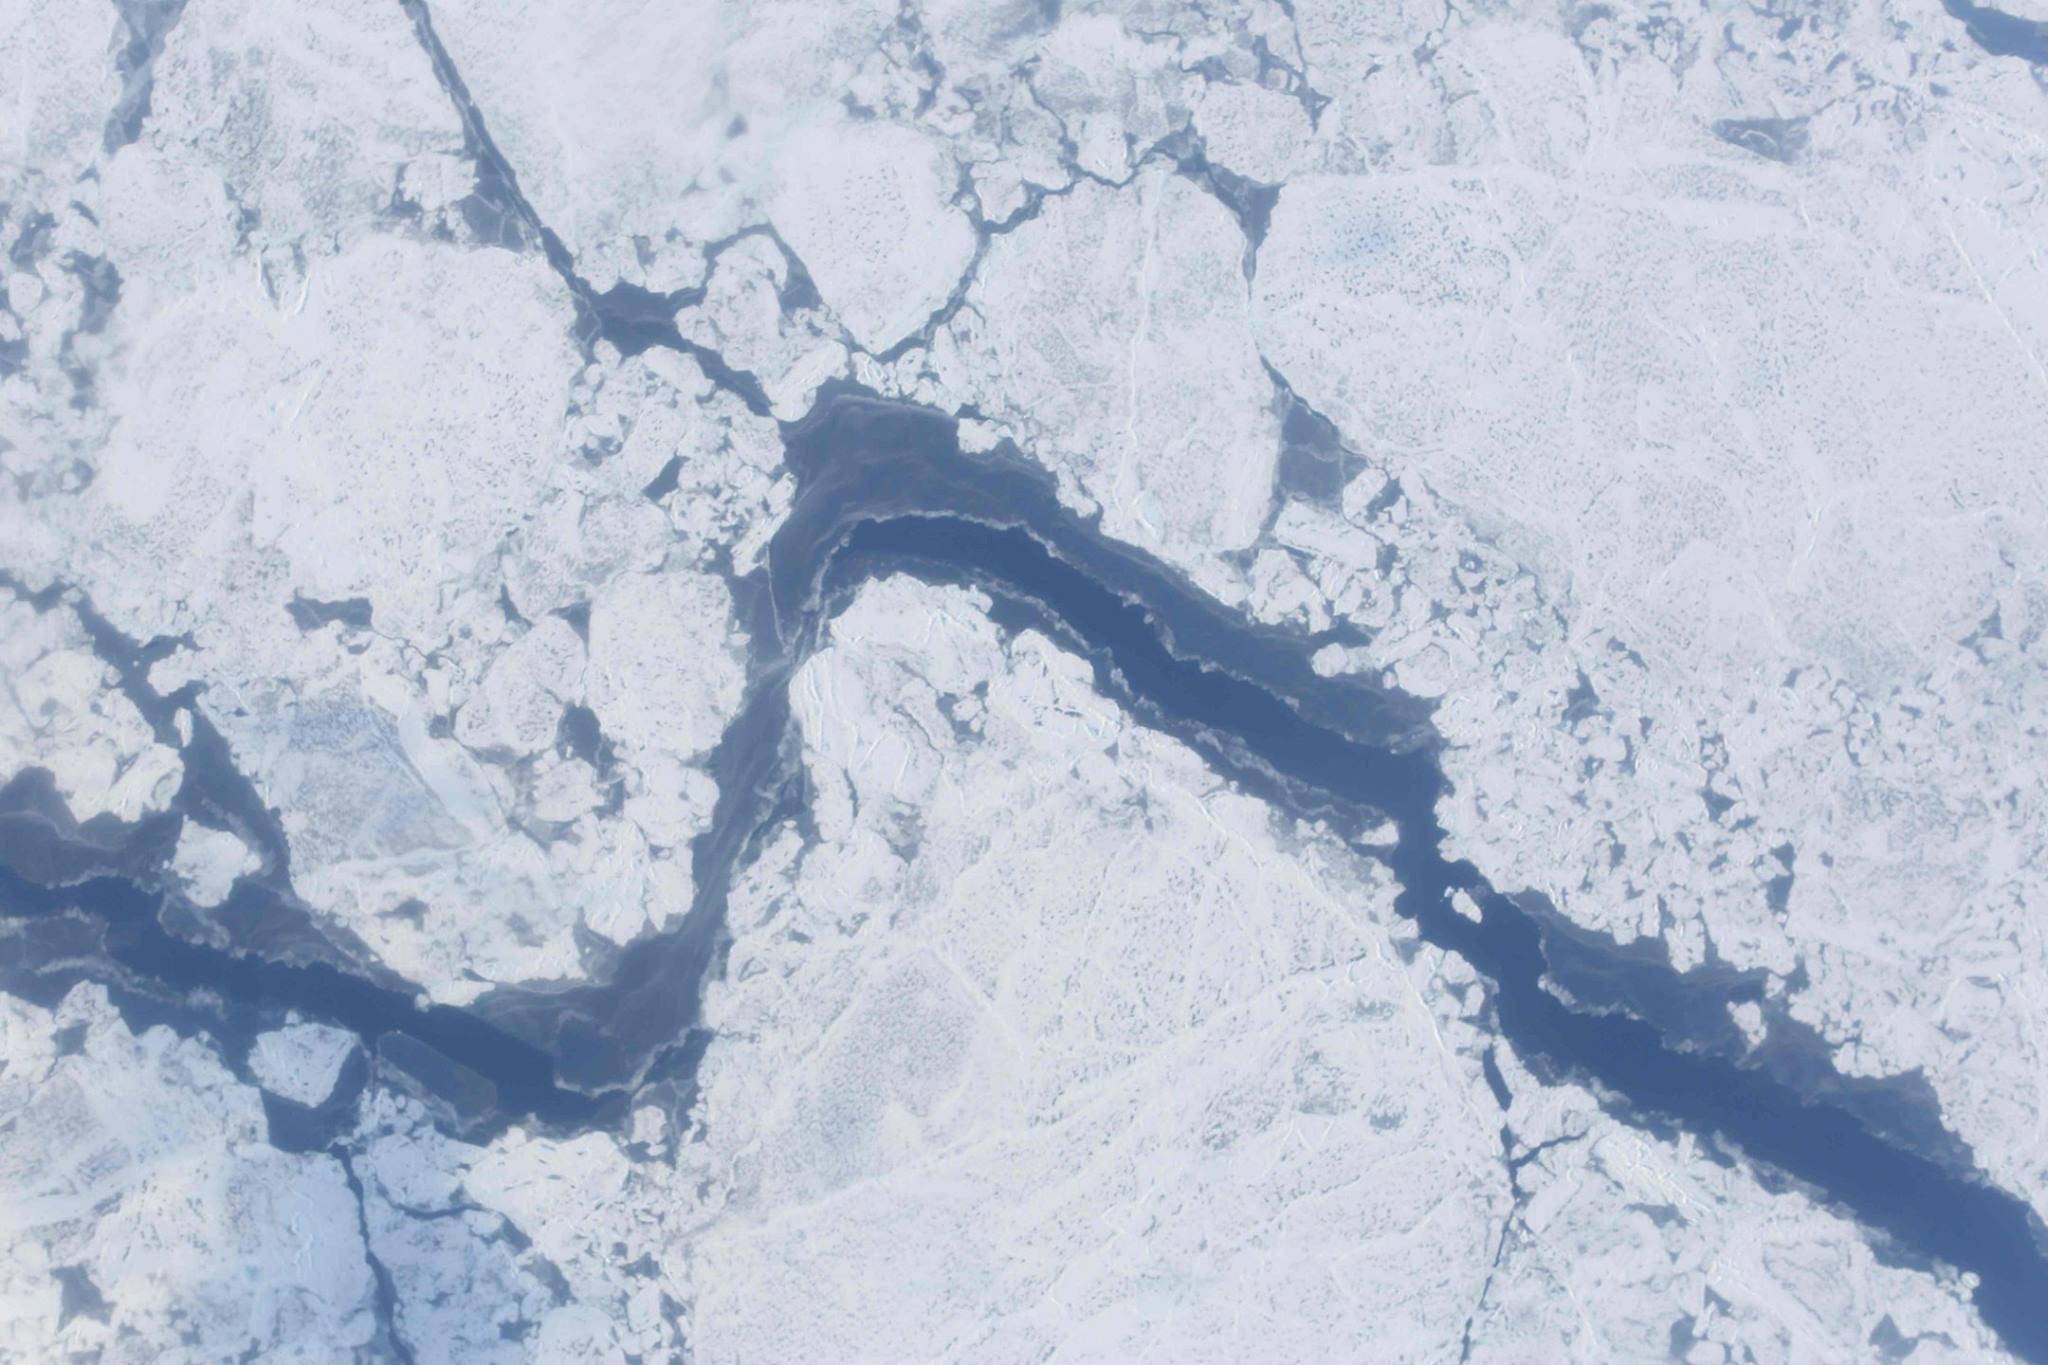 Digital camera shot of large sea ice lead